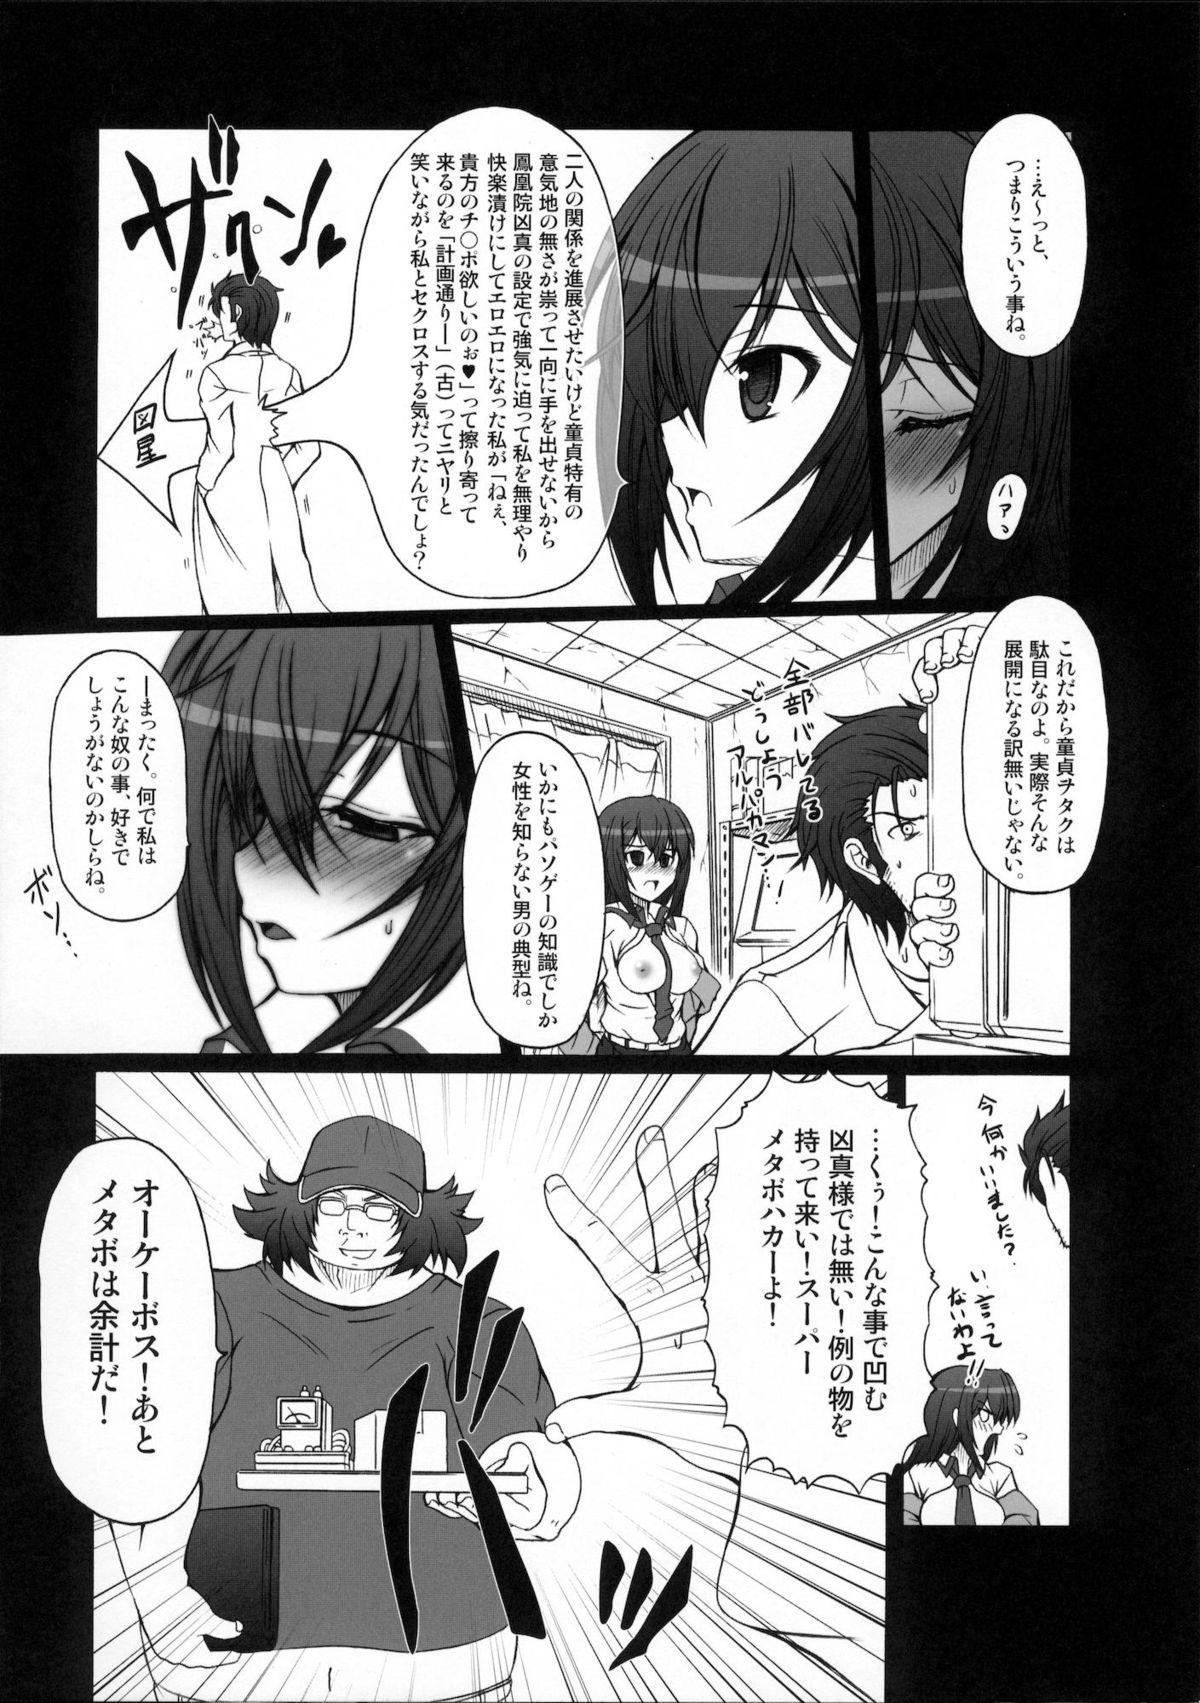 HOBBY'S BLOCK!! 14 Kairaku Tousaku no Ecstasy 8